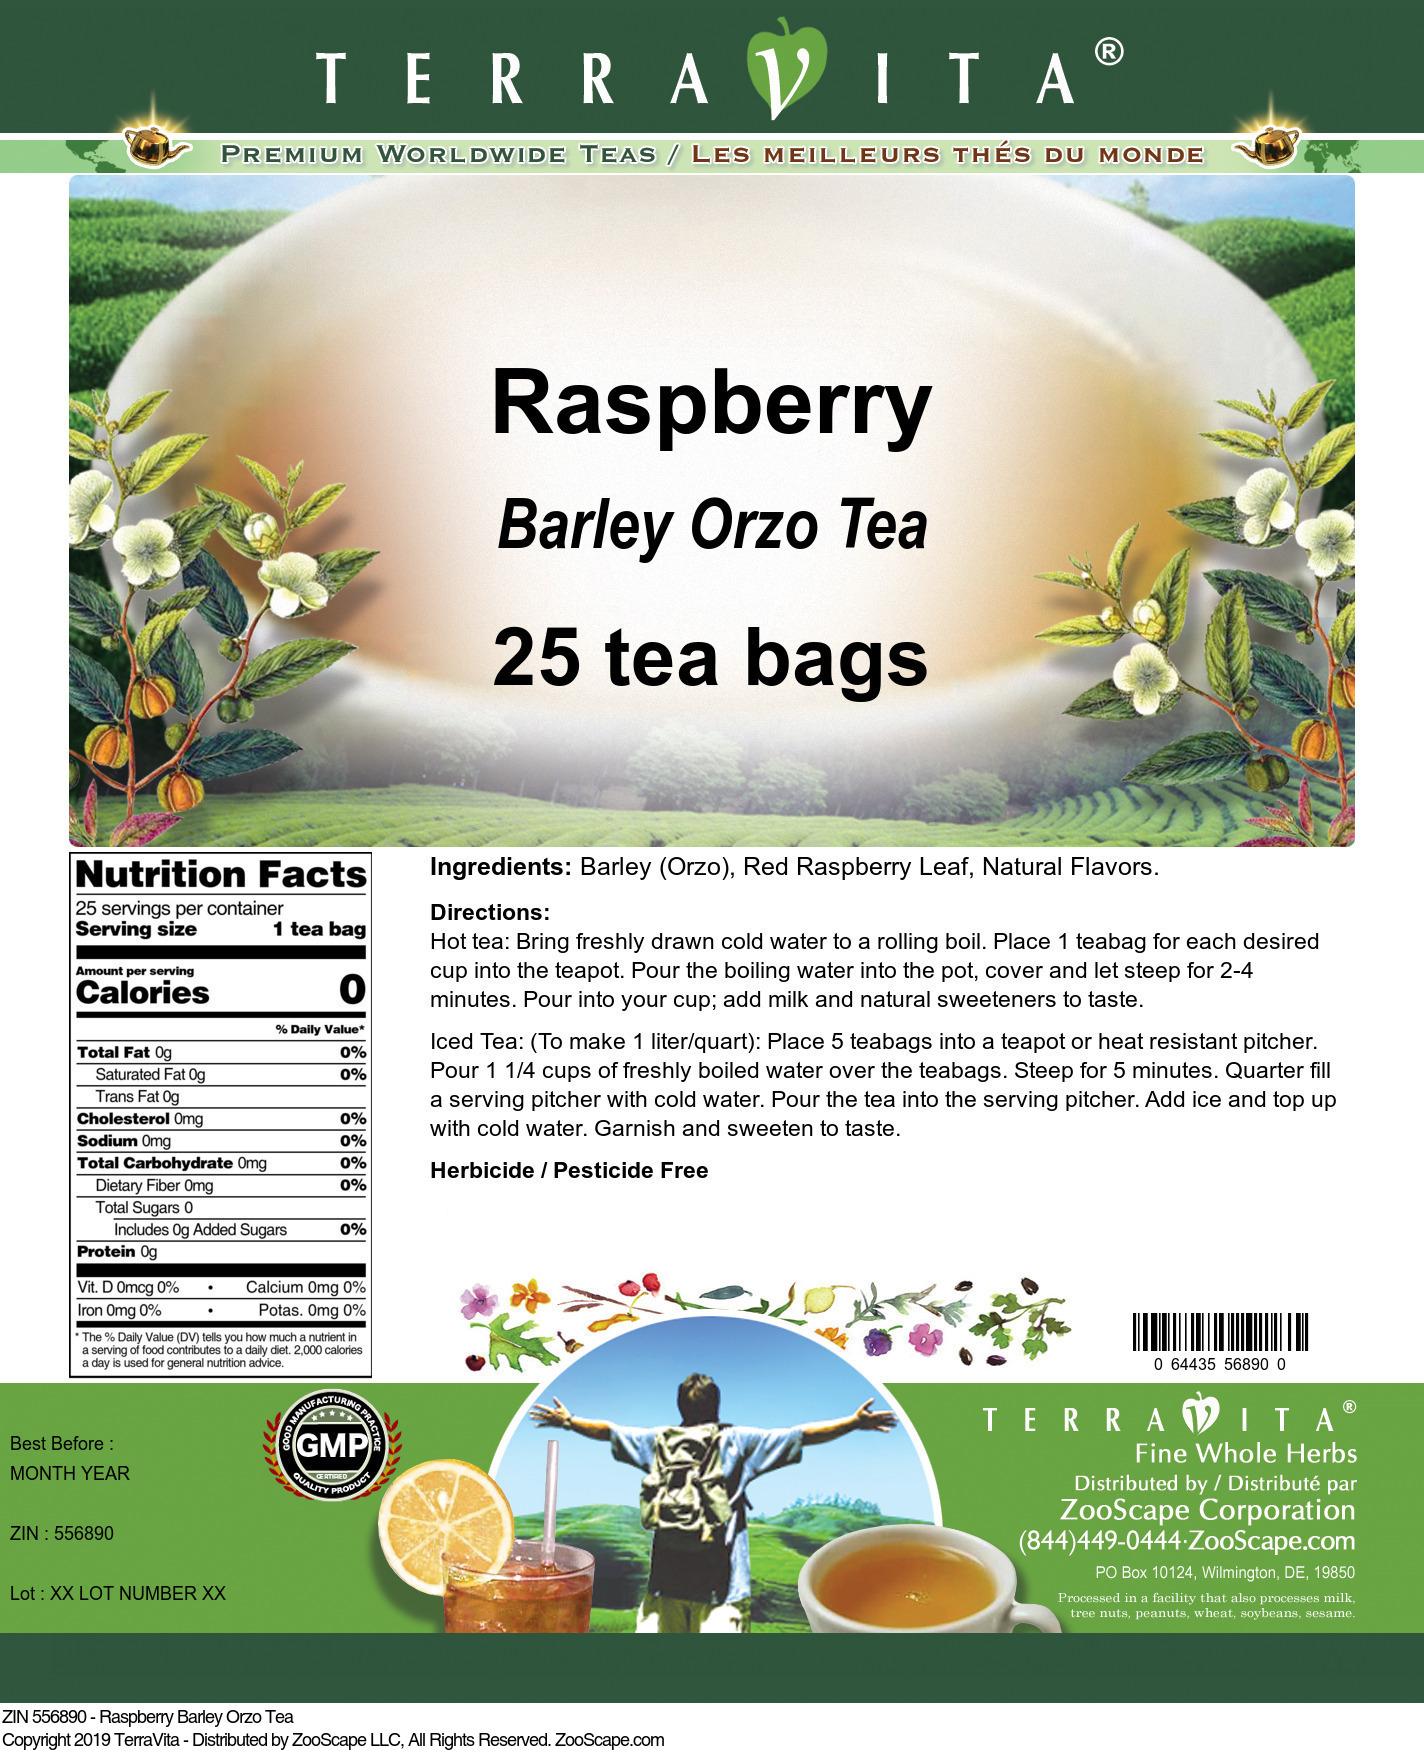 Raspberry Barley Orzo Tea